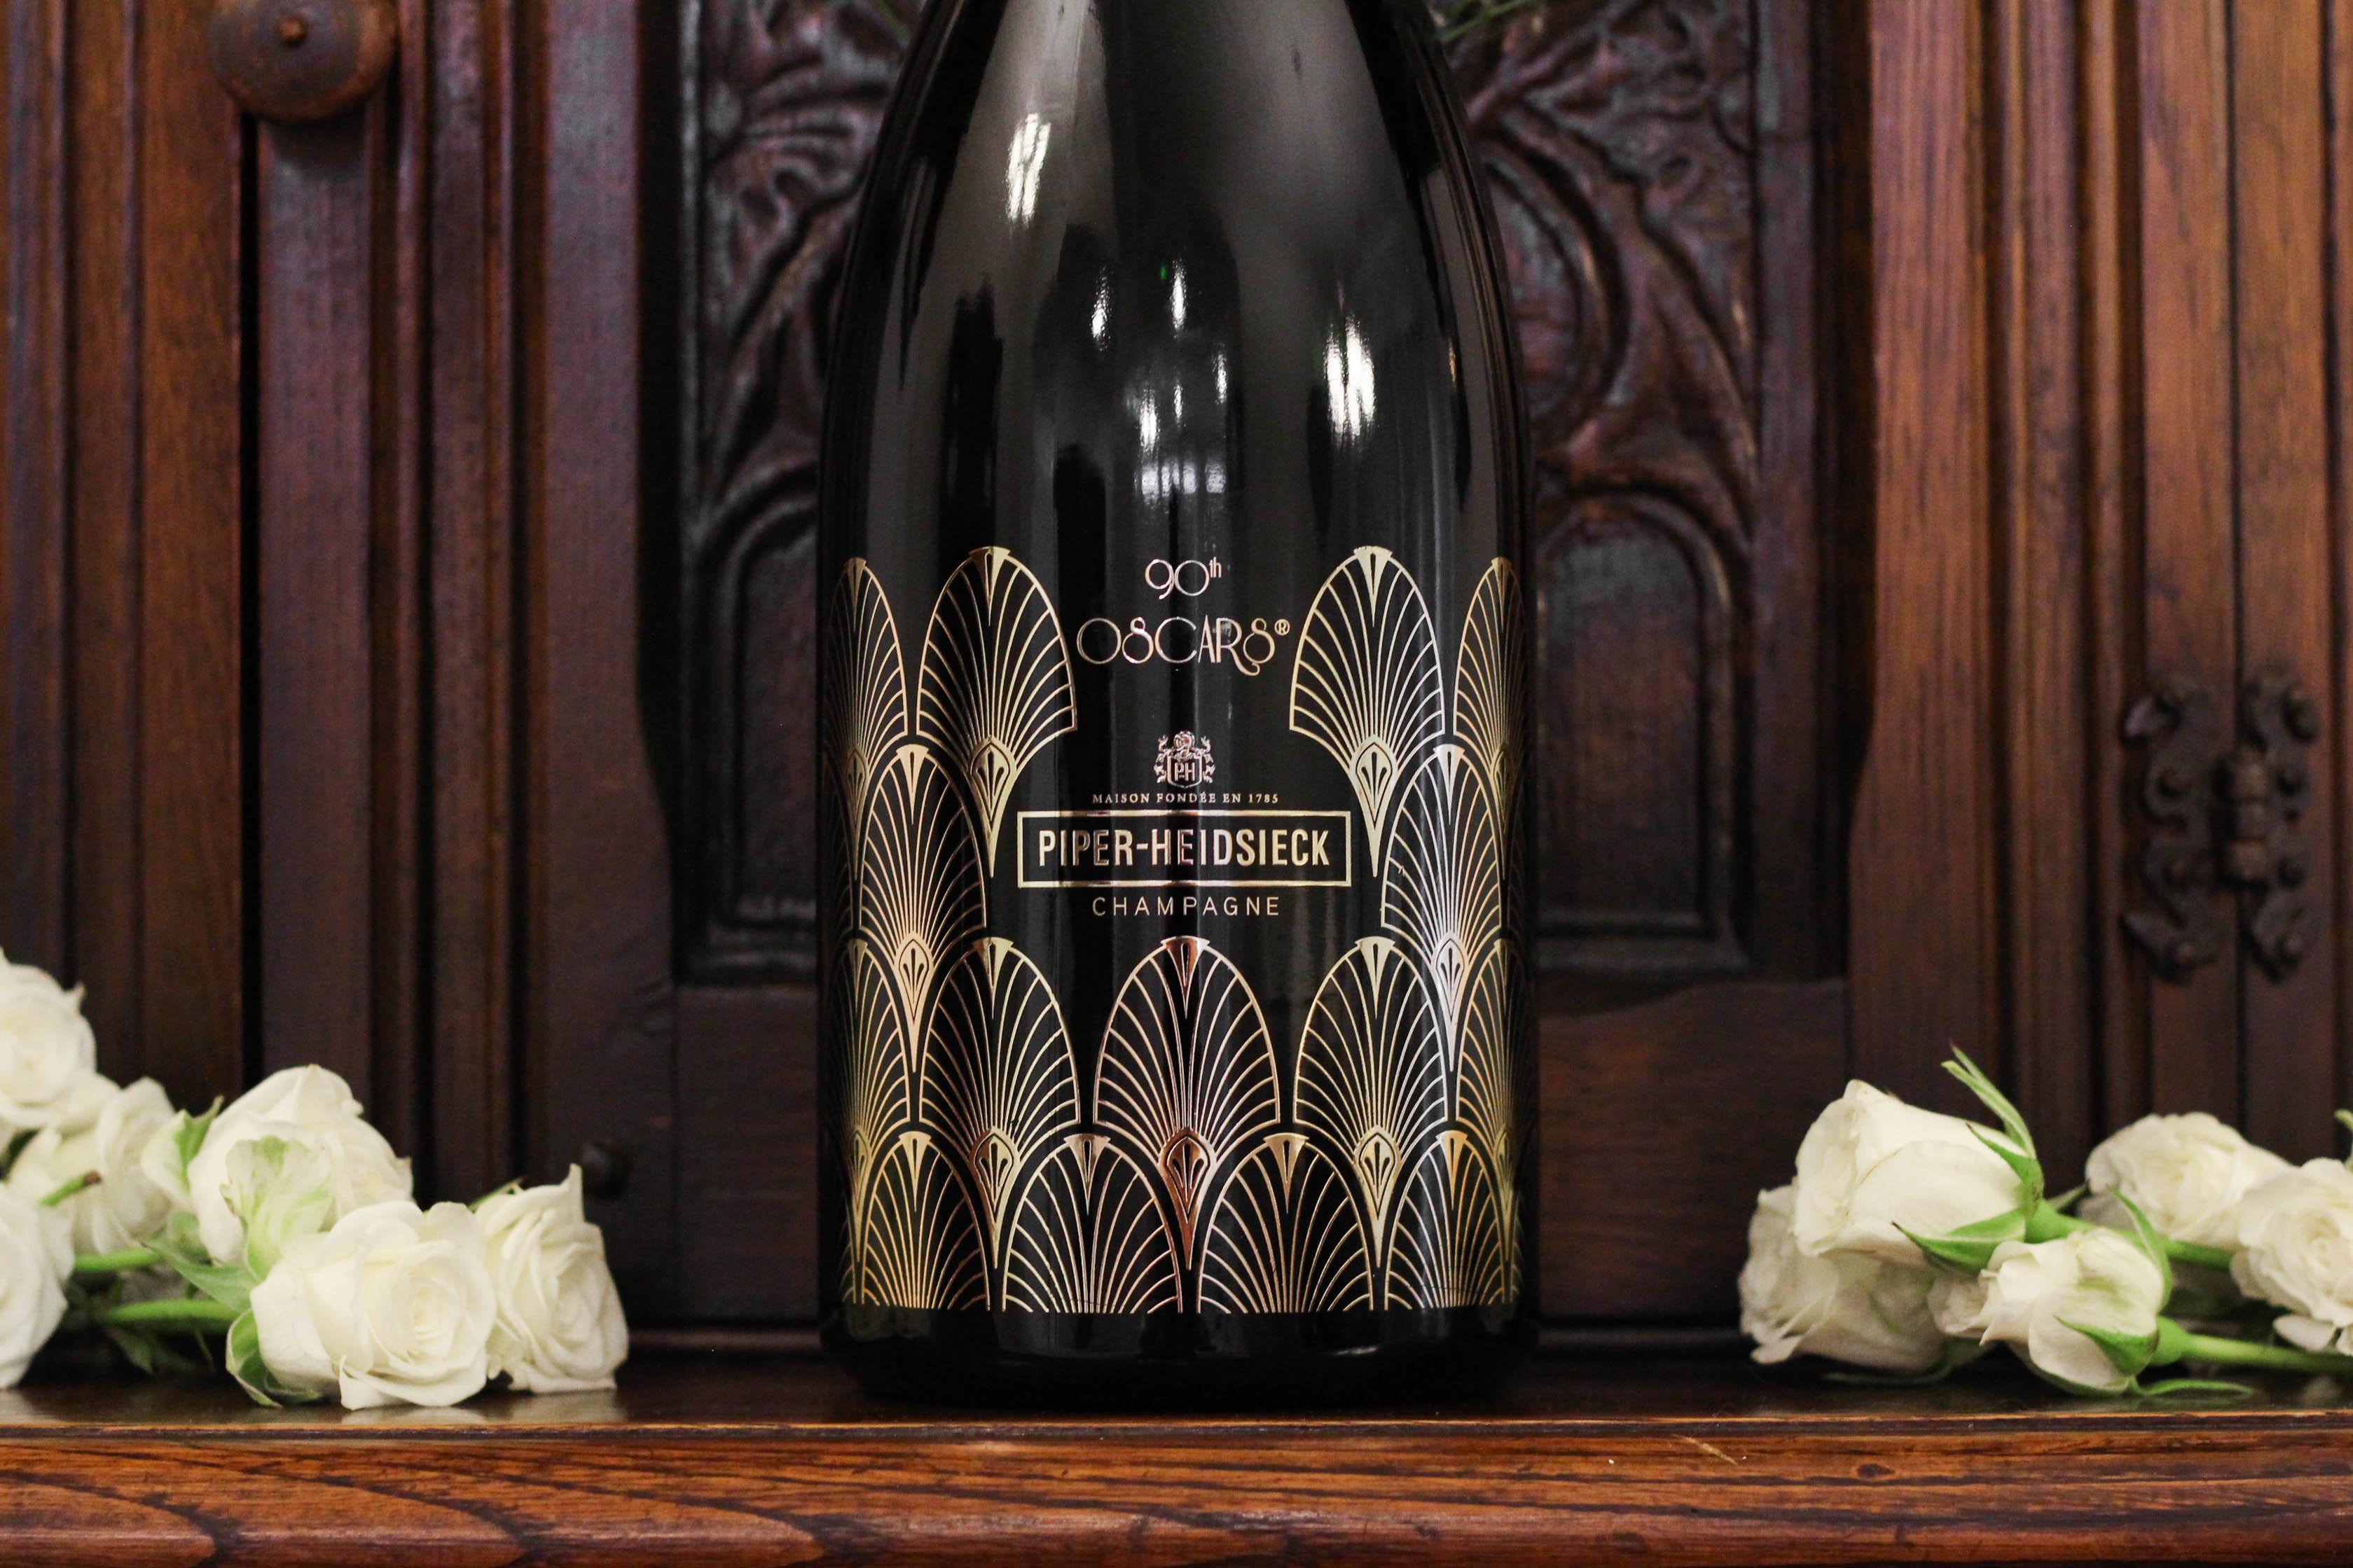 90th Oscars 2018 Piper Heidsieck Coppola Winery 3 - Cheers to the 90th Oscars: Piper-Heidsieck & Coppola Winery